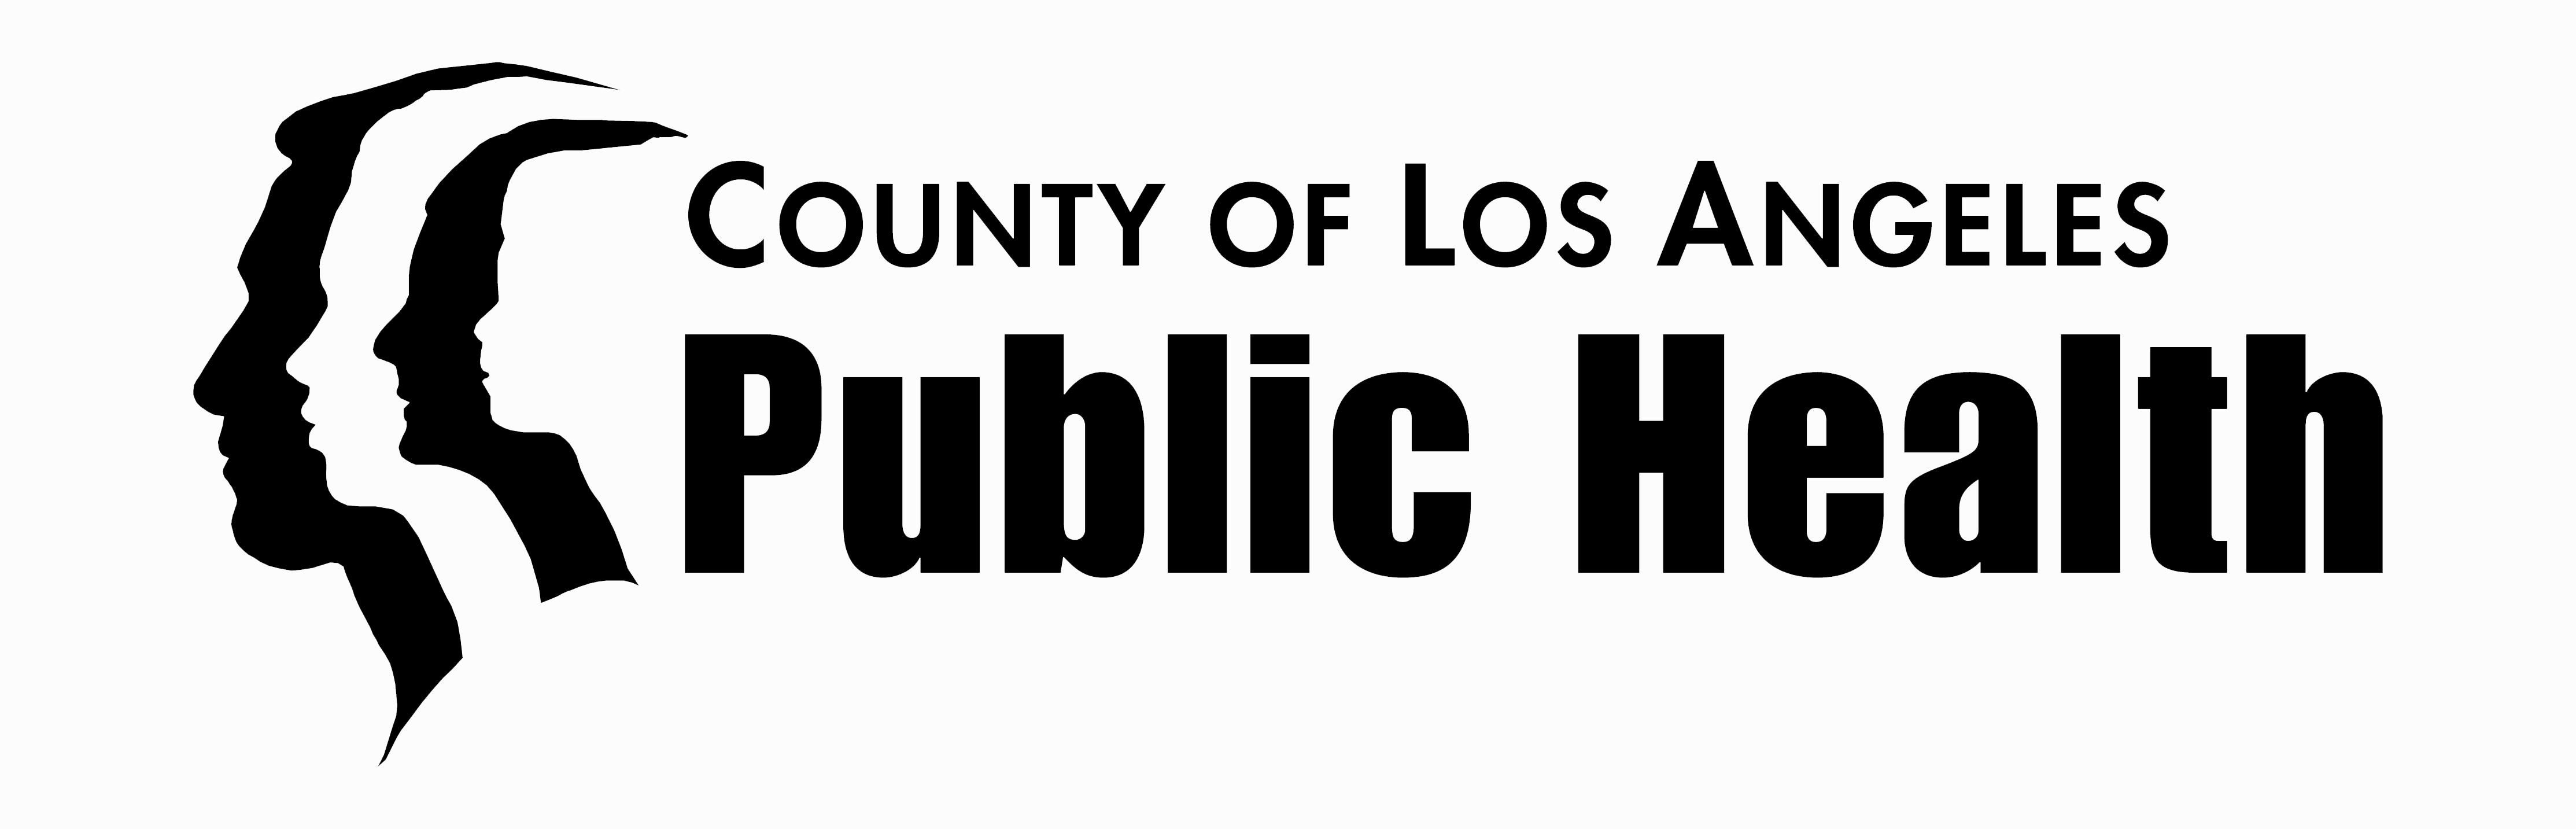 Los Angeles County Department of Public Health - Public